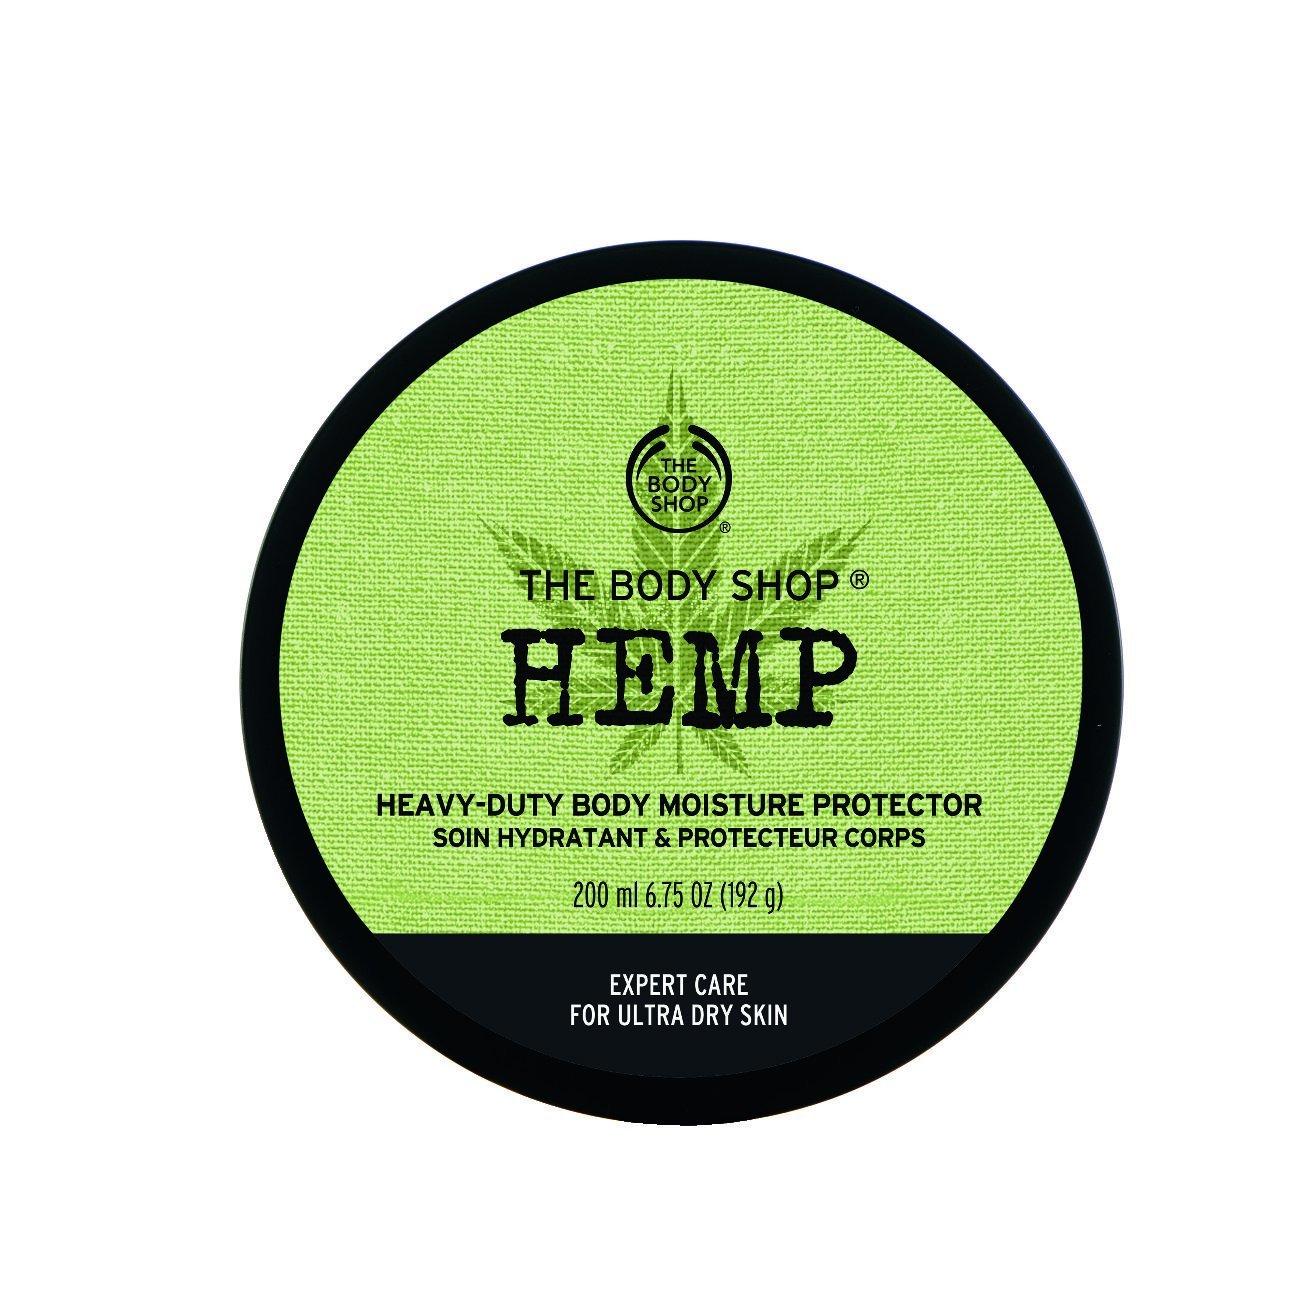 Hanf Körperbutter 200 ml für sehr trockene Haut Hemp Body Butter 200ml For VERY DRY SKIN The Body Shop 5028197850821